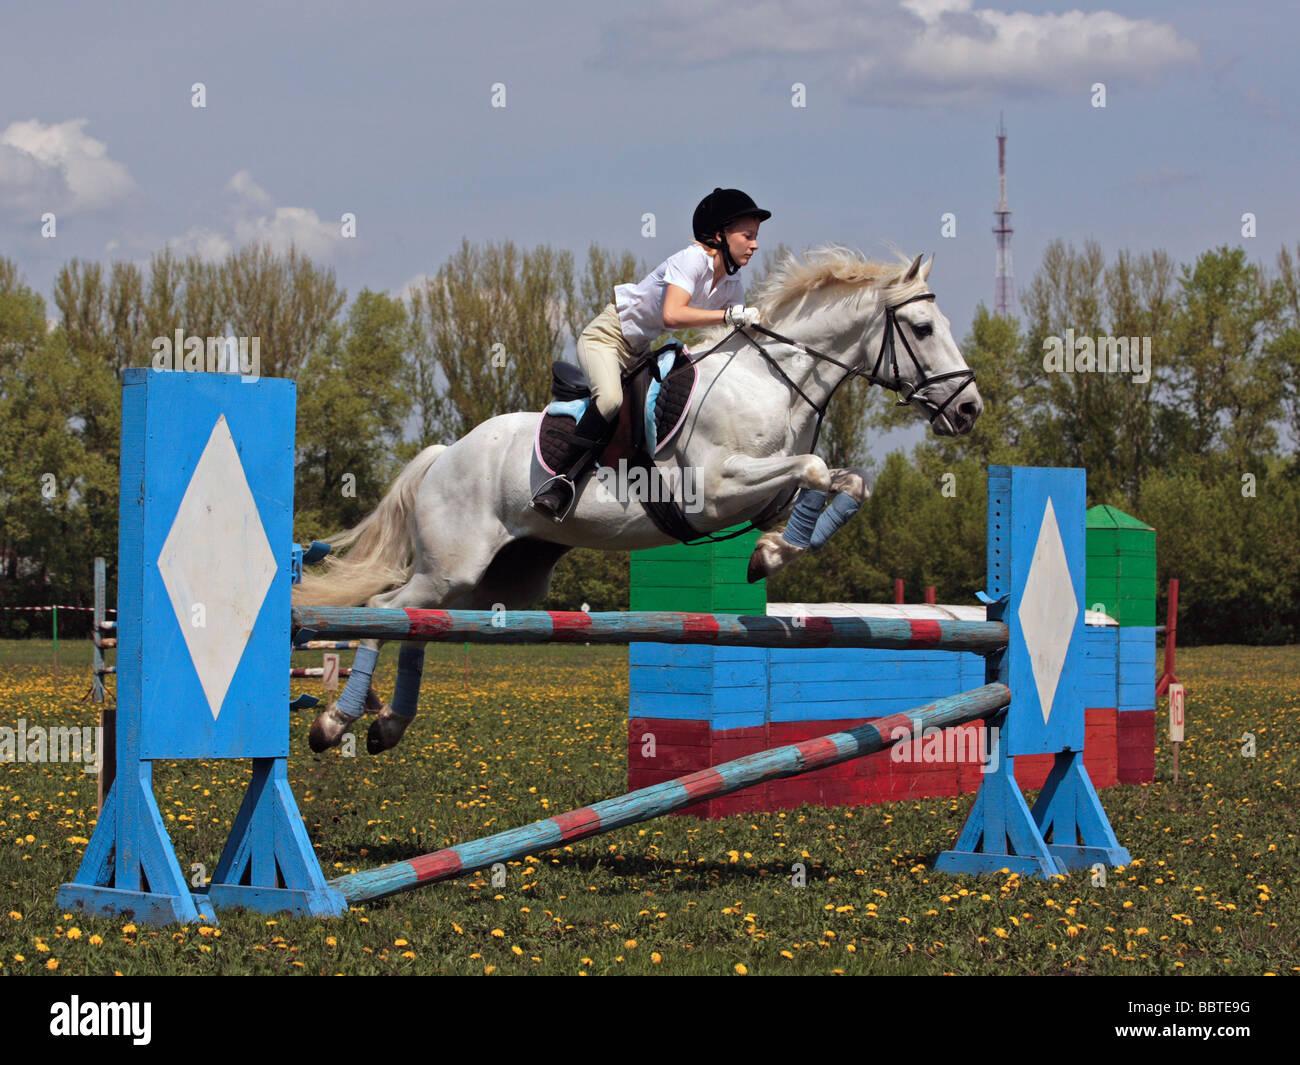 Equestrian sport - Stock Image